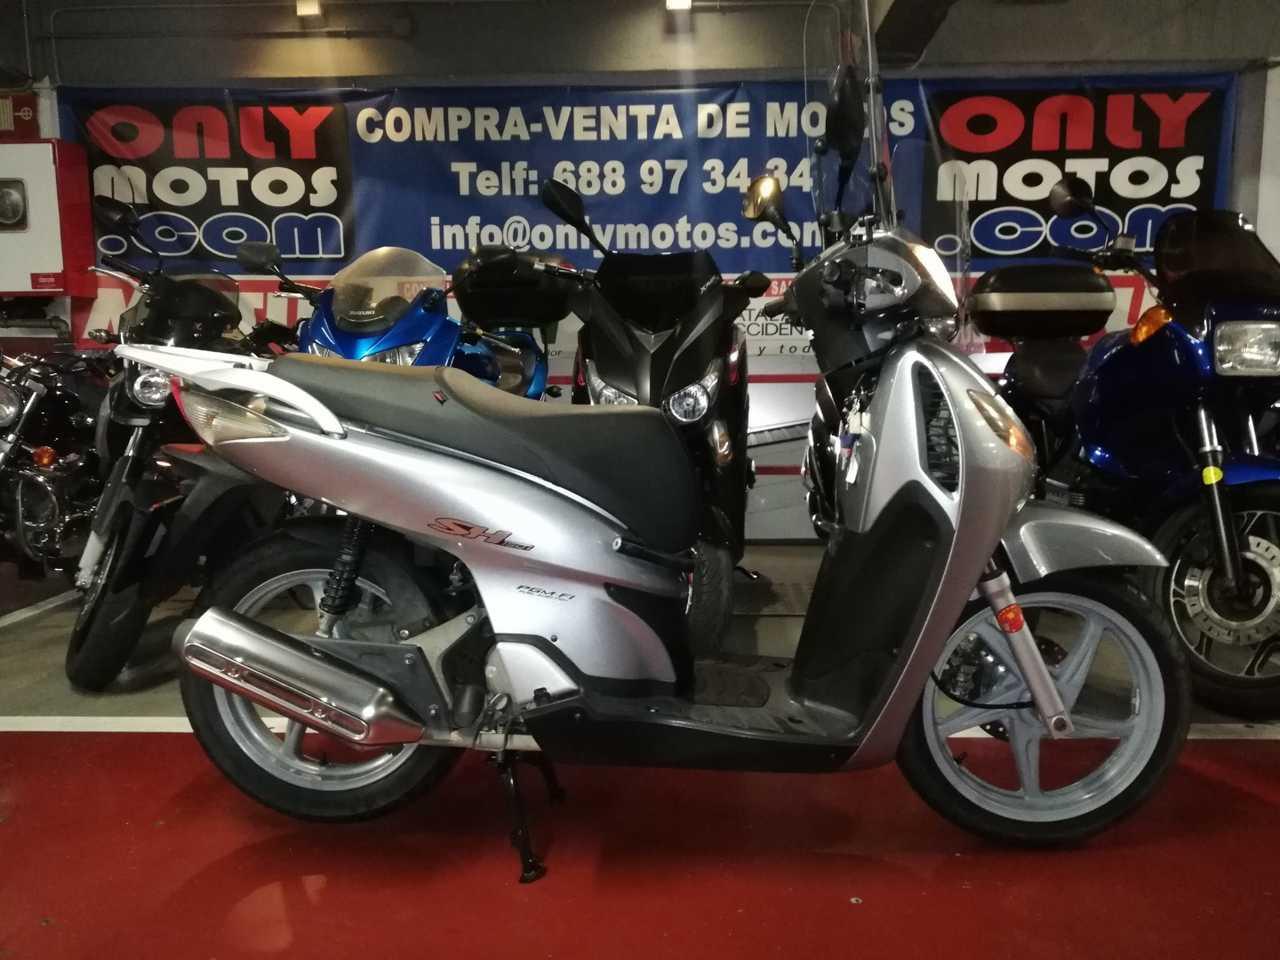 Honda SH 150 i  - Foto 1